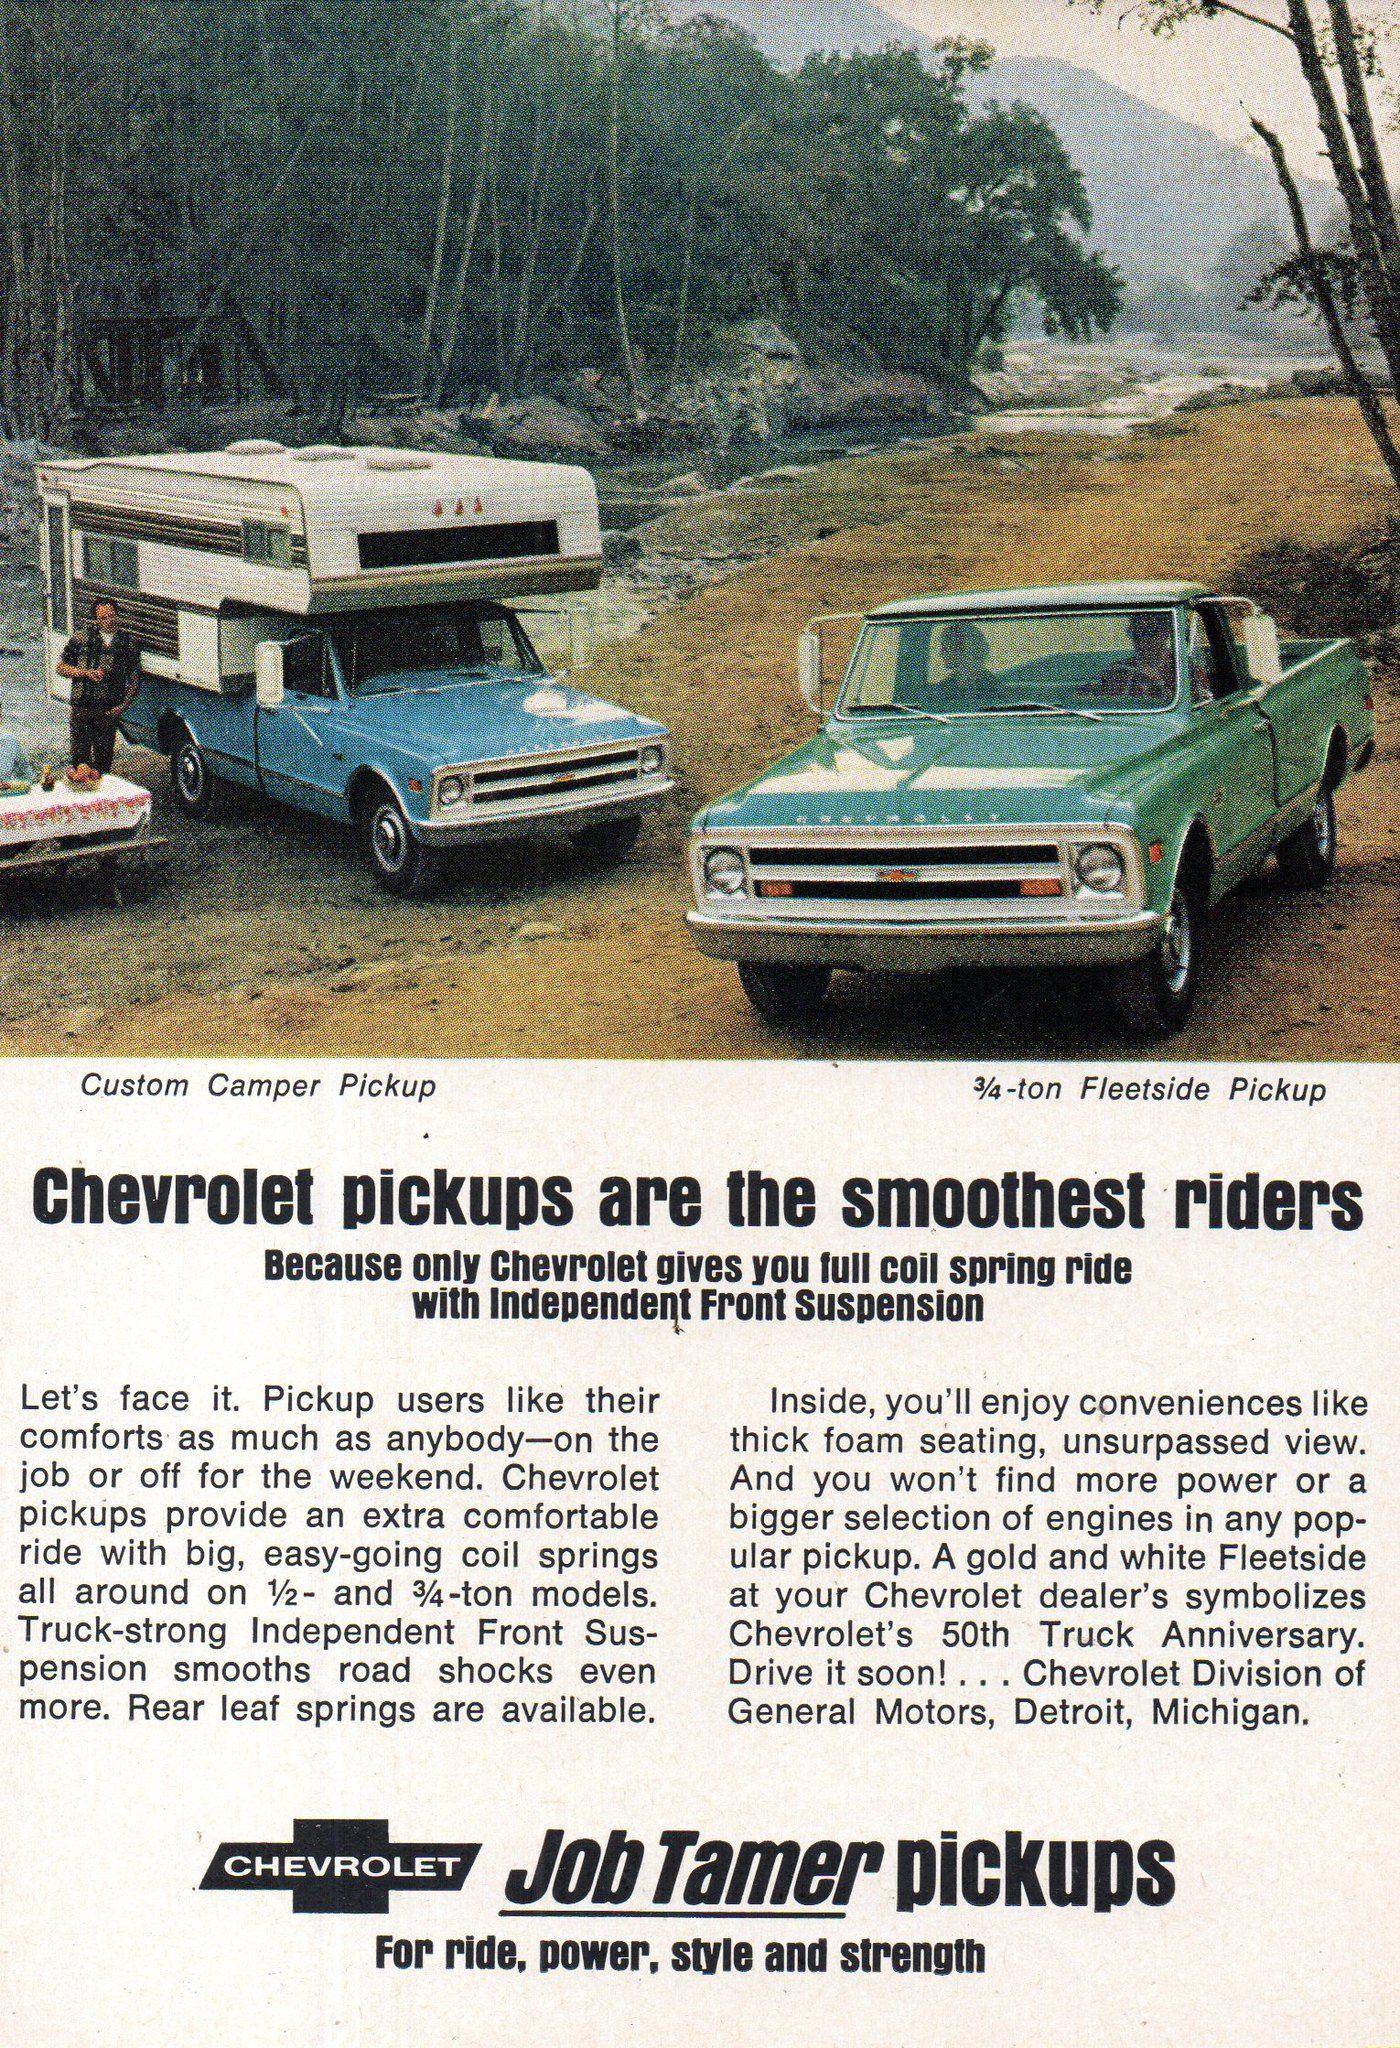 1968 Chevrolet Custom Camper & Quarter Ton Fleetside Pickup USA Original Magazine Advertisement